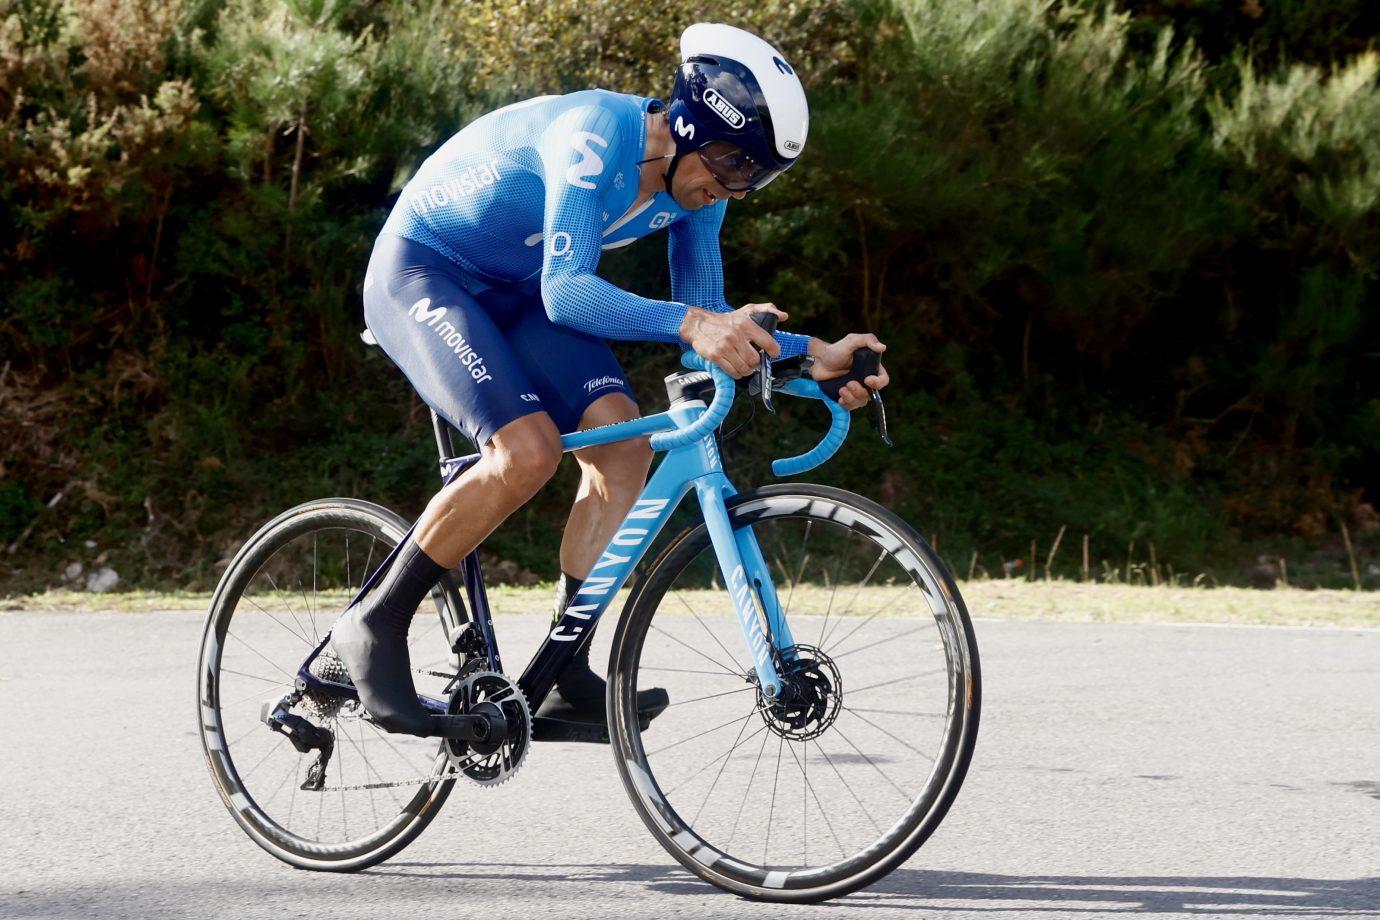 Imagen de la noticia 'Oliveira 3rd at Ézaro TT; GC podium further away'